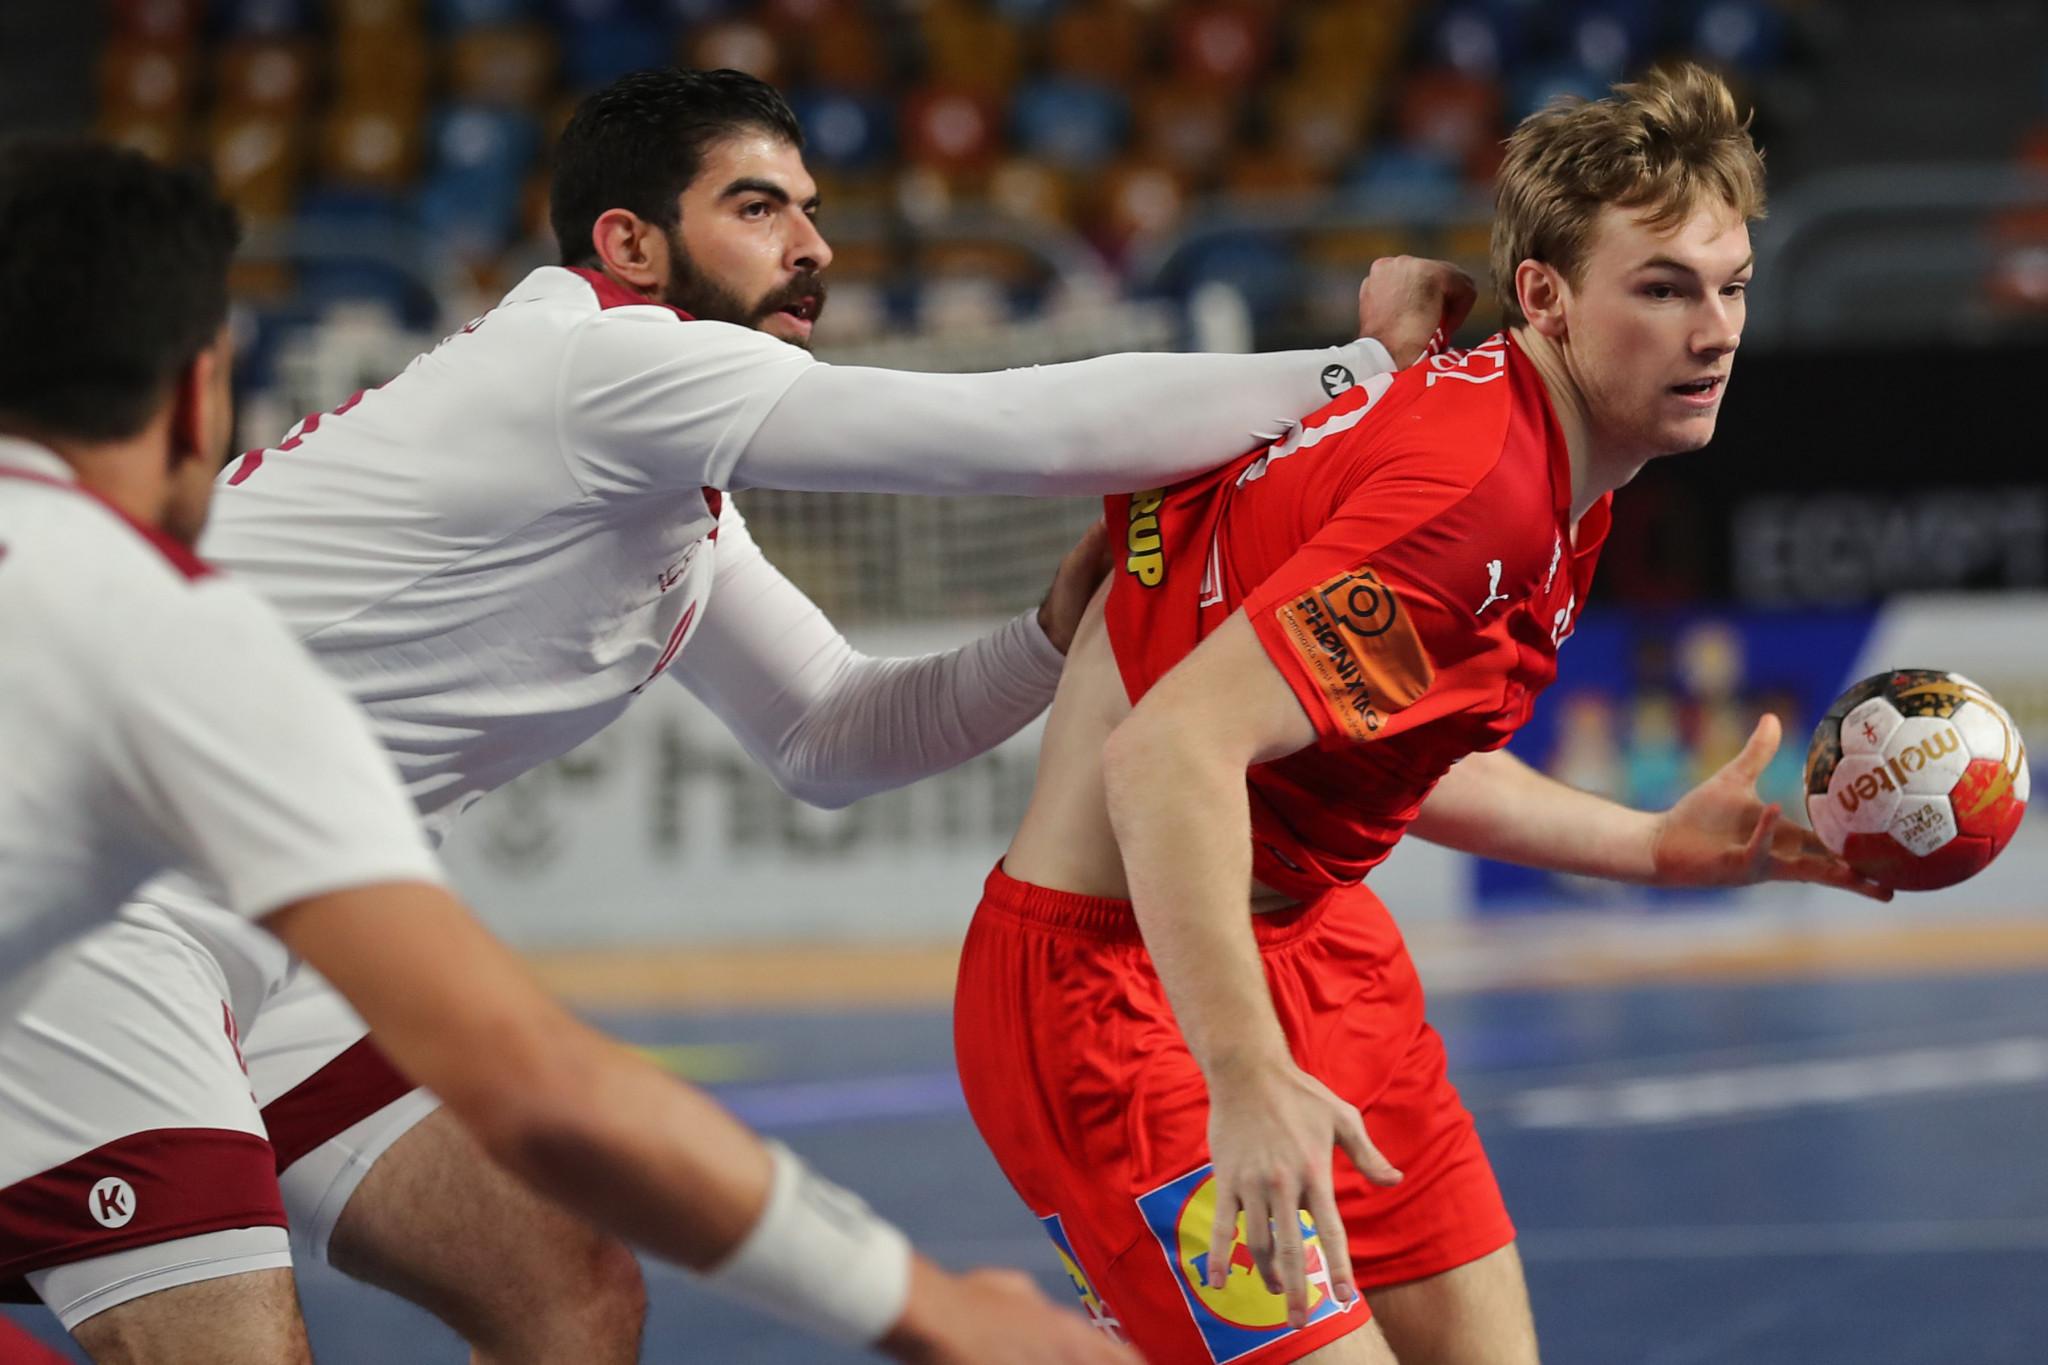 Defending champions Denmark among winners as main round of World Men's Handball Championship continues